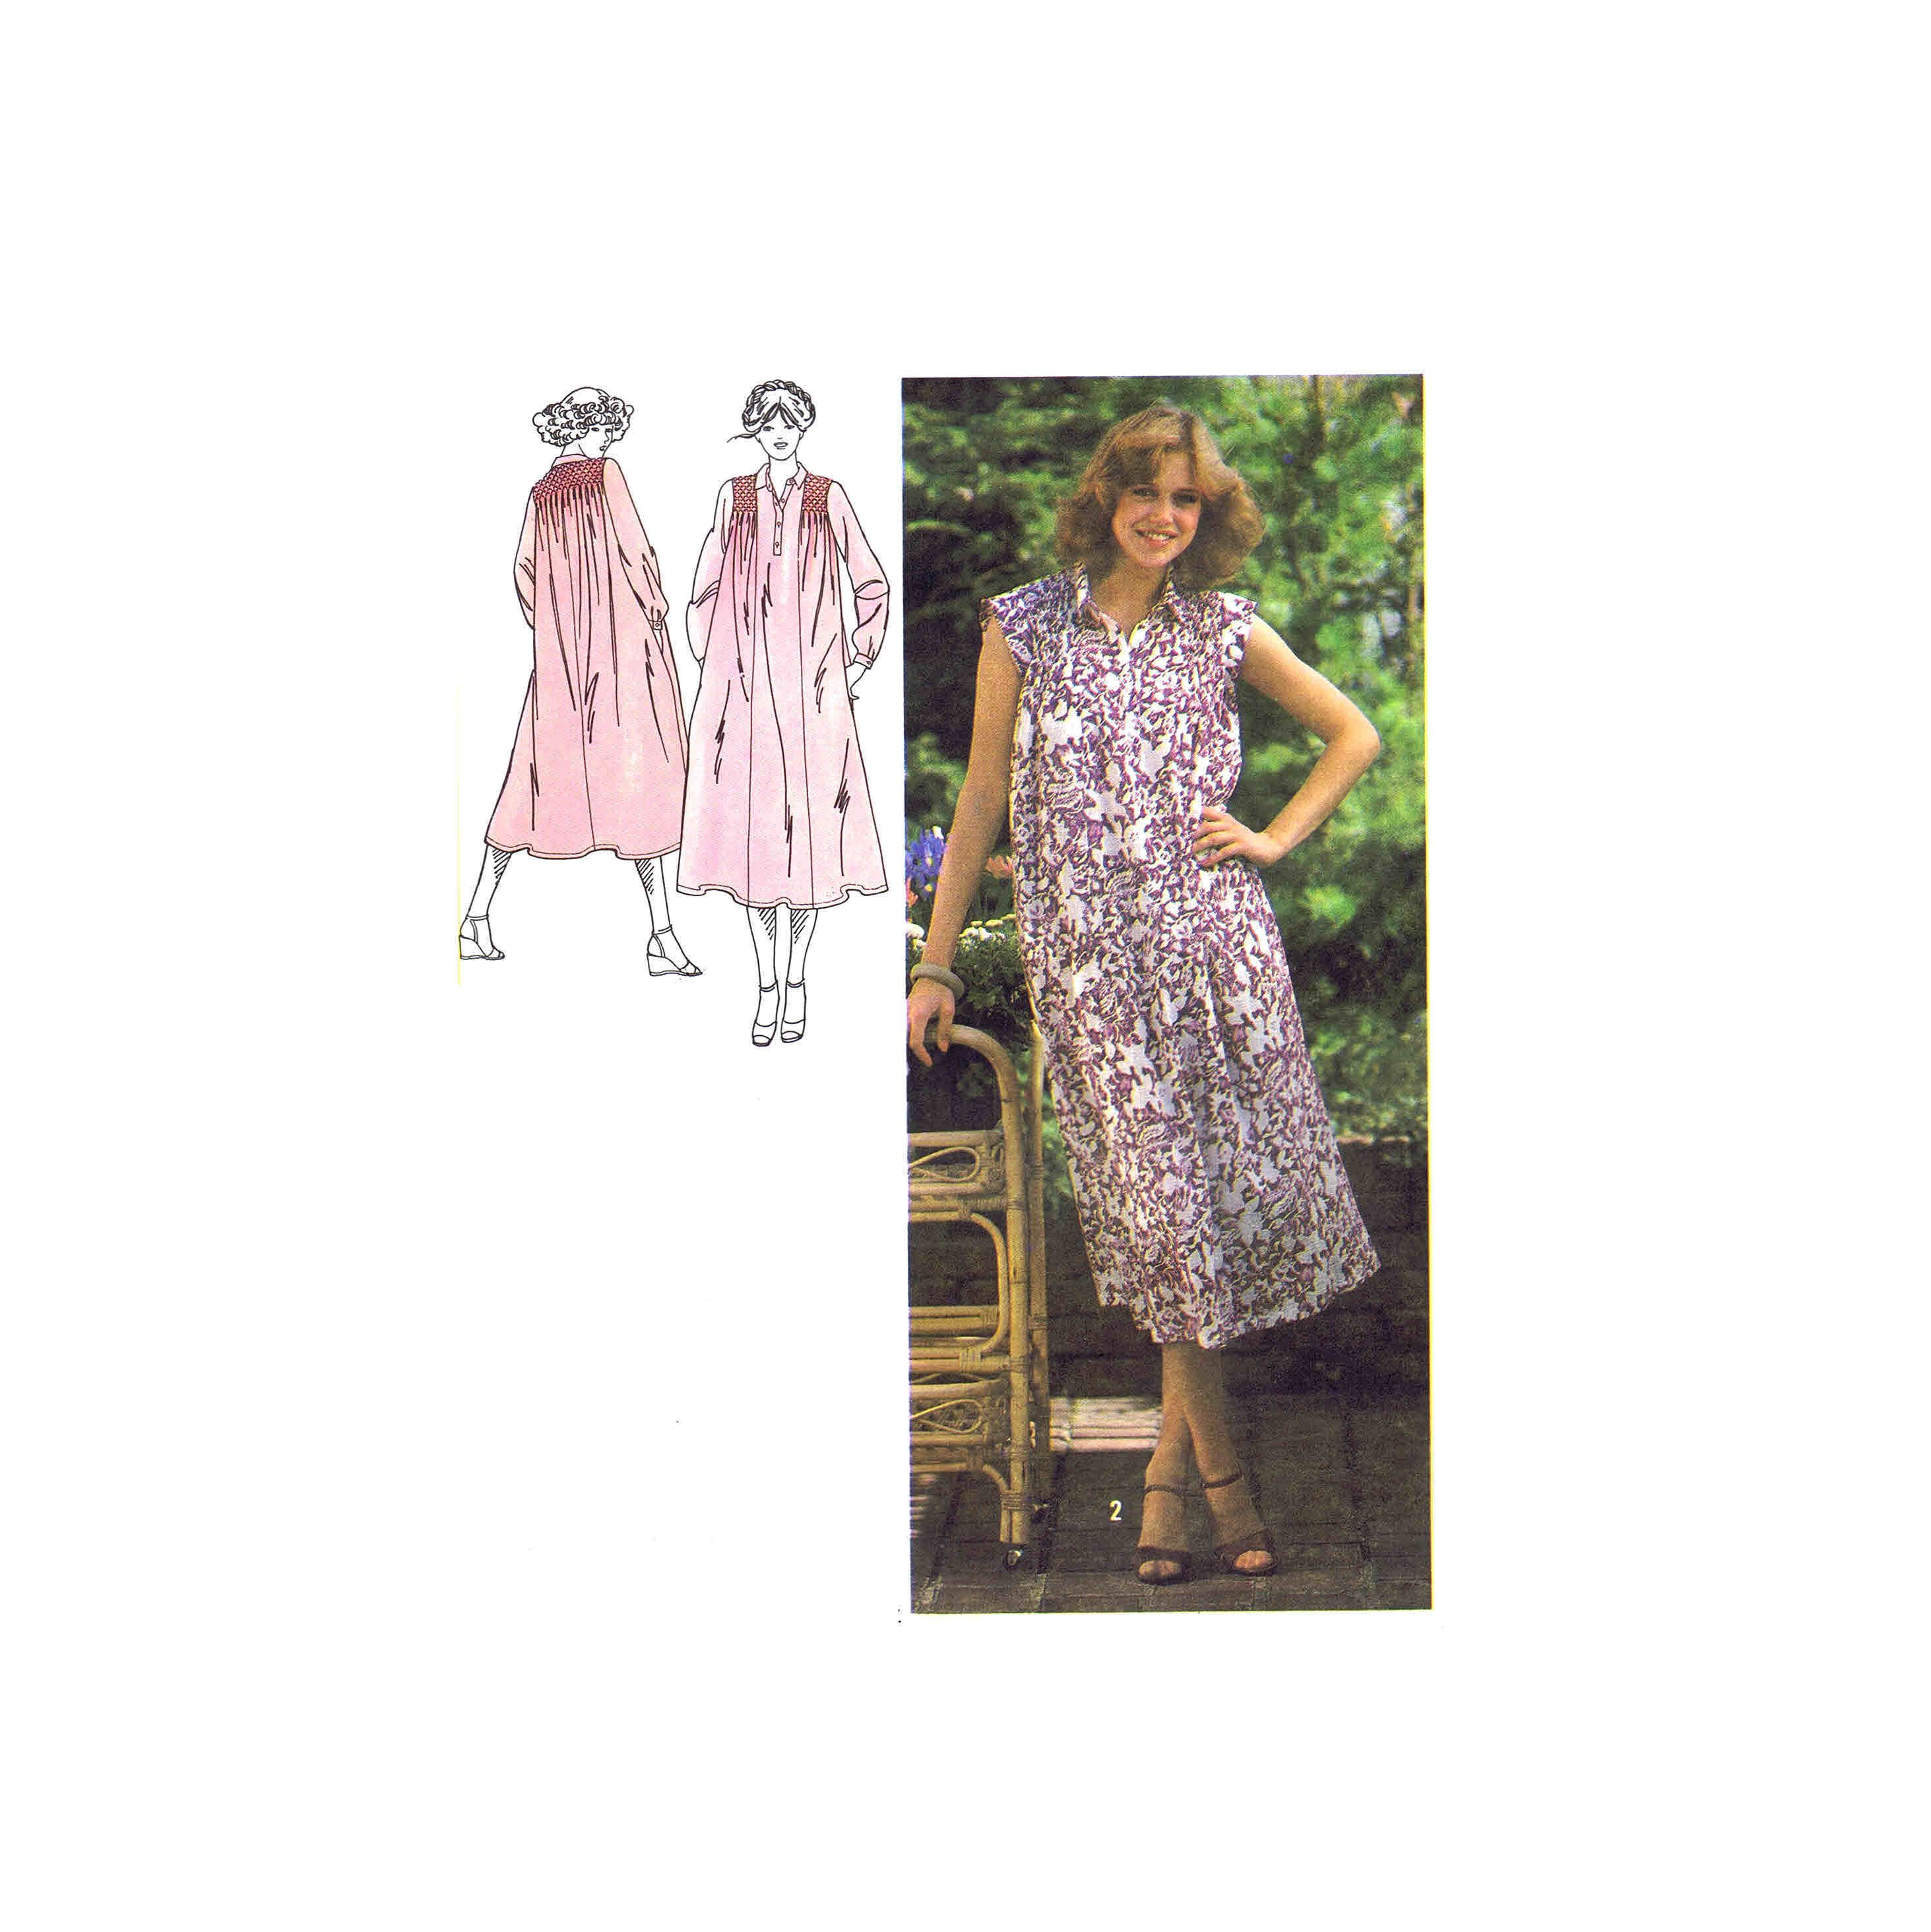 1970s Misses Smocked Dress Simplicity 8916 Vintage Sewing Pattern